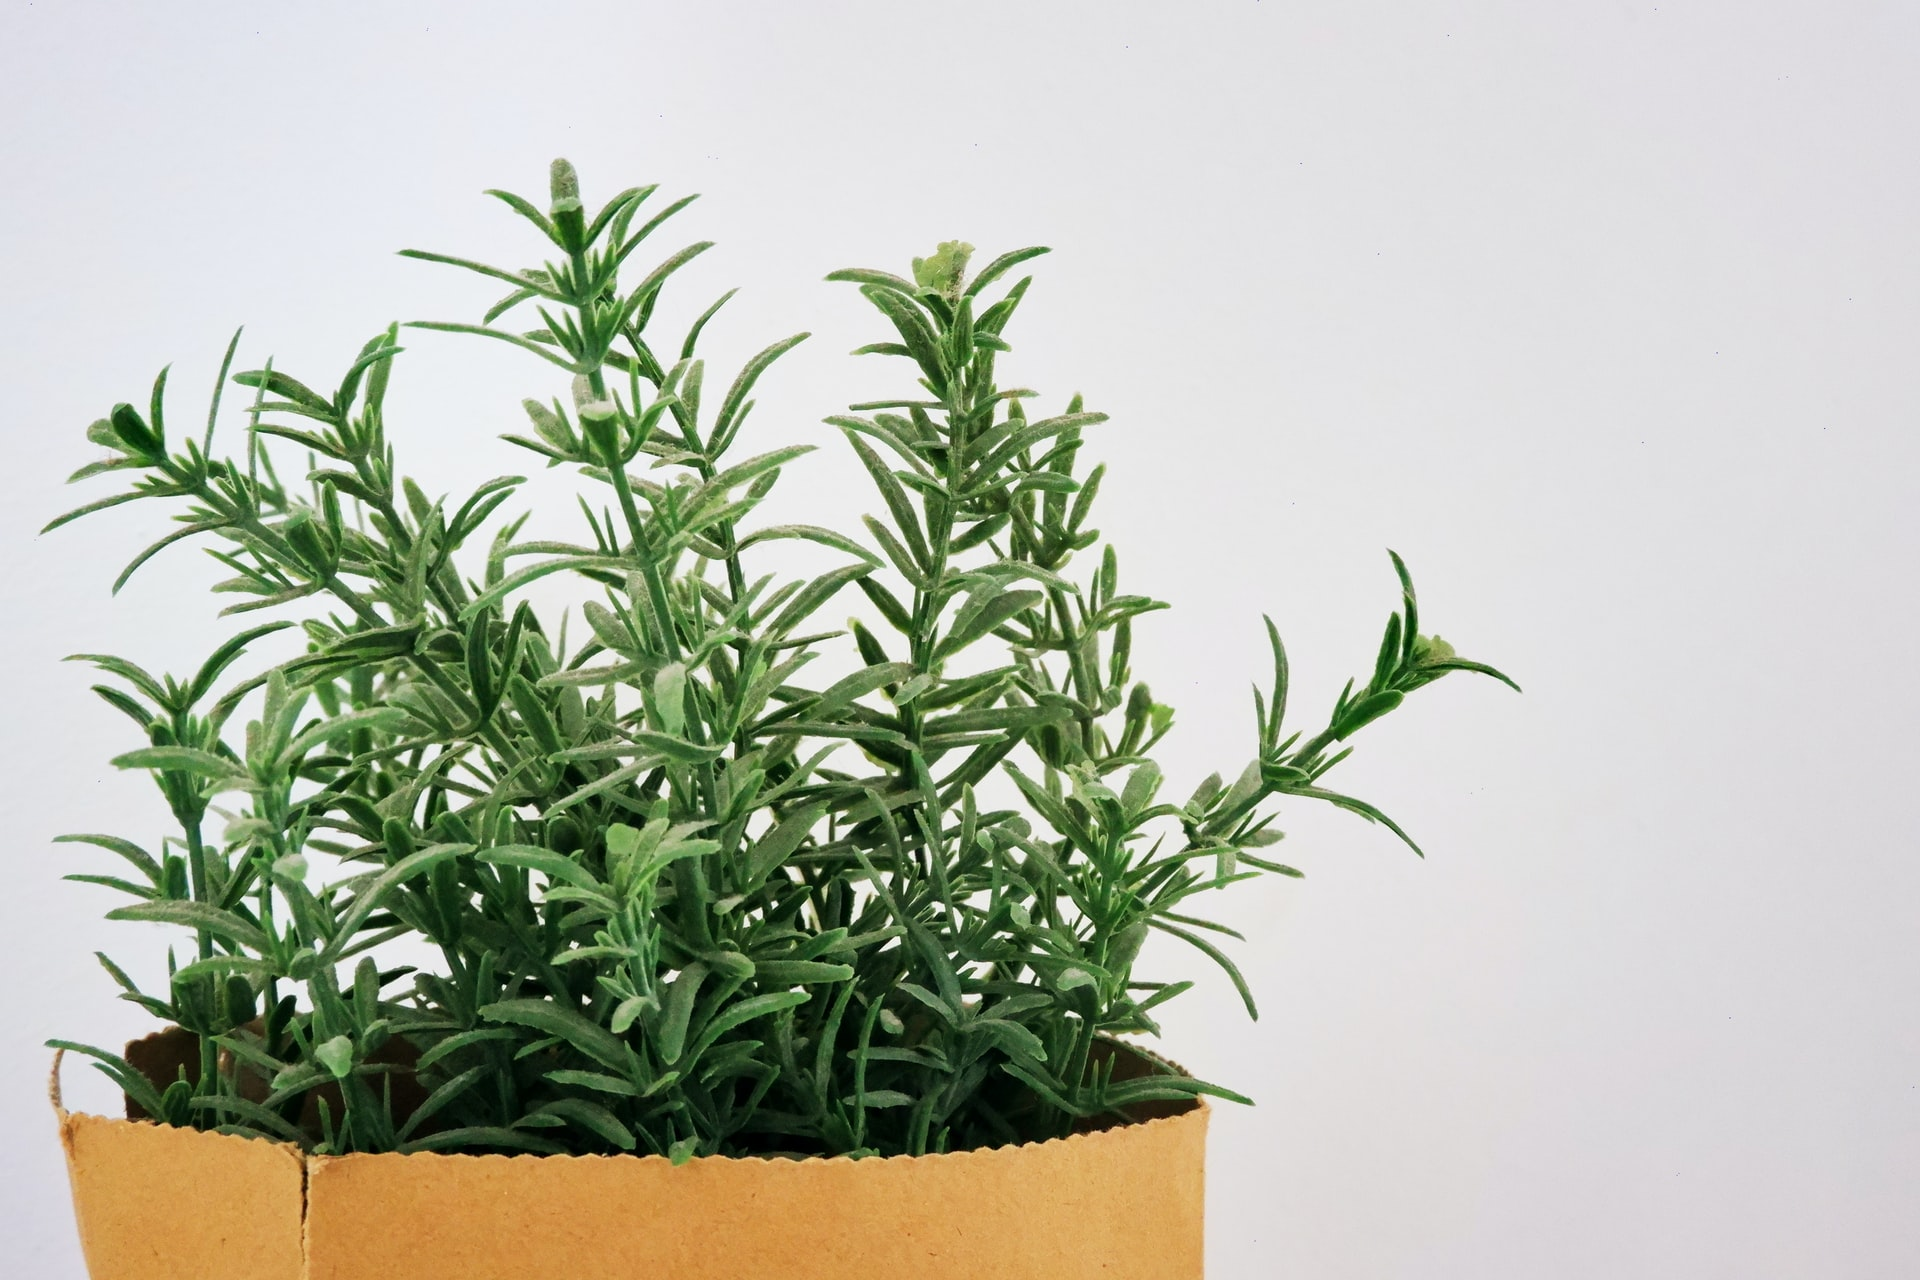 Rosemary - edible plants to grow